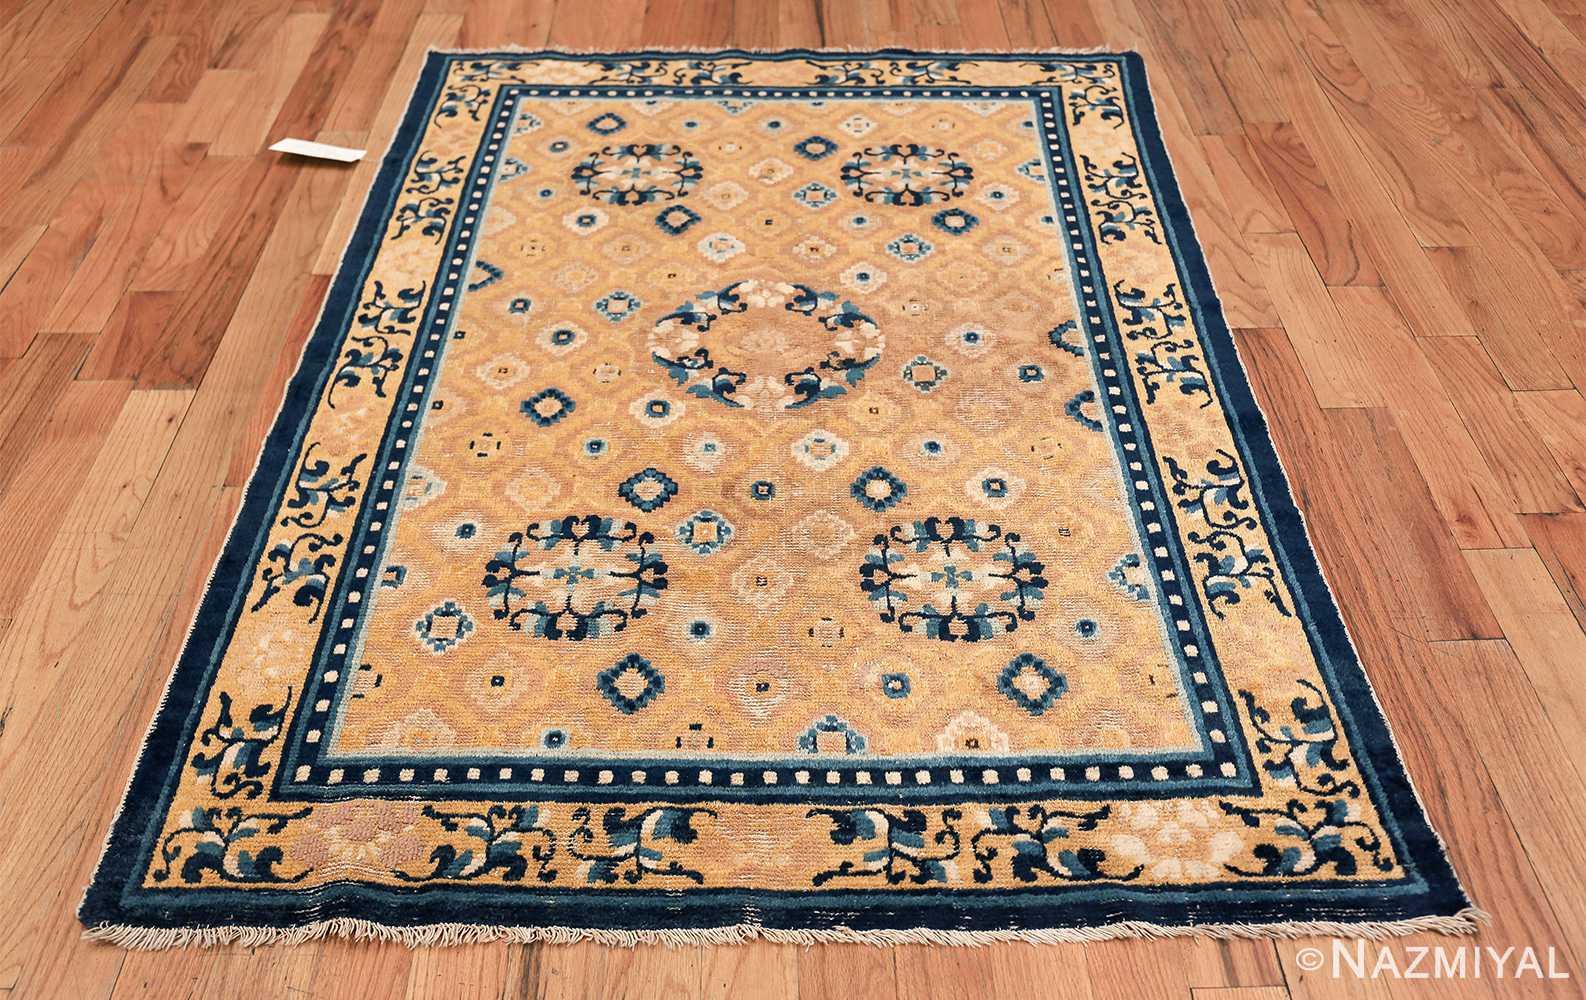 Mid 19th Century Chinese Ningxia rug 49798 whole design Nazmiyal